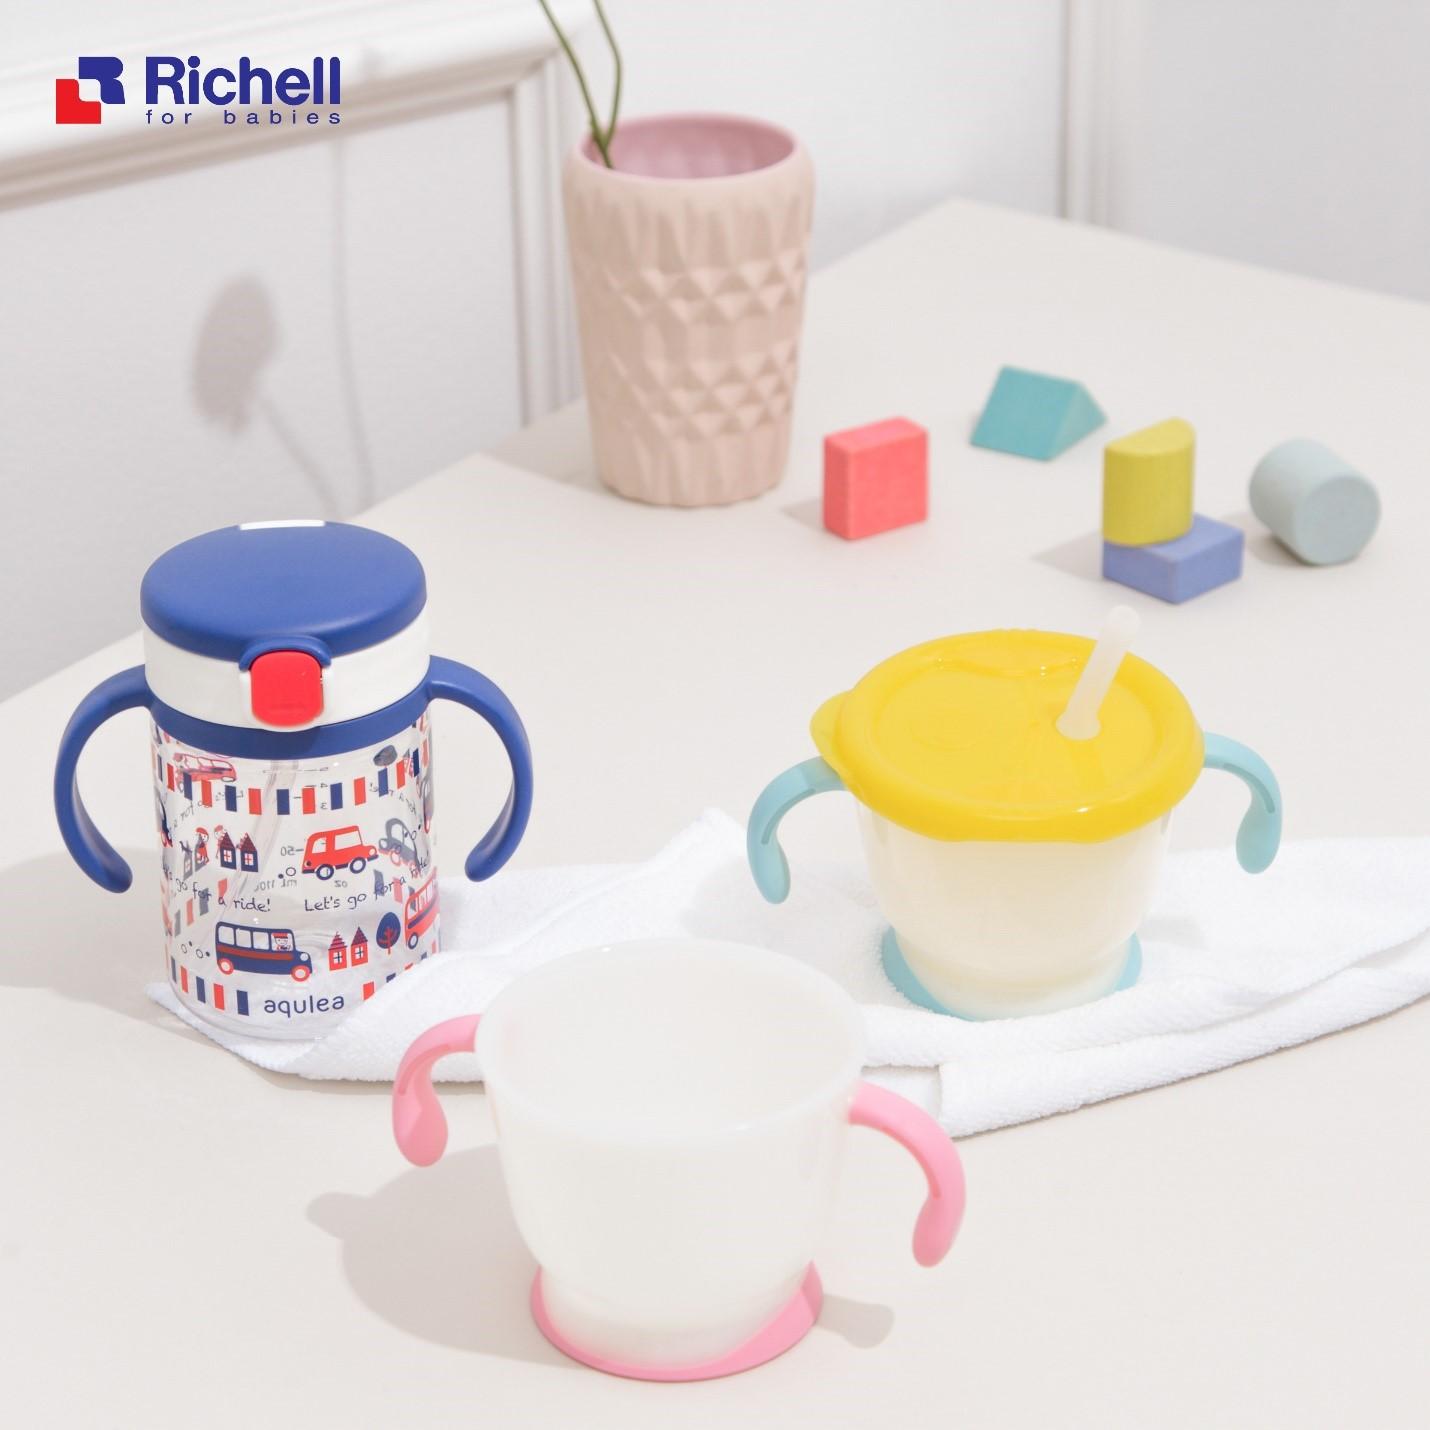 Richell Baby